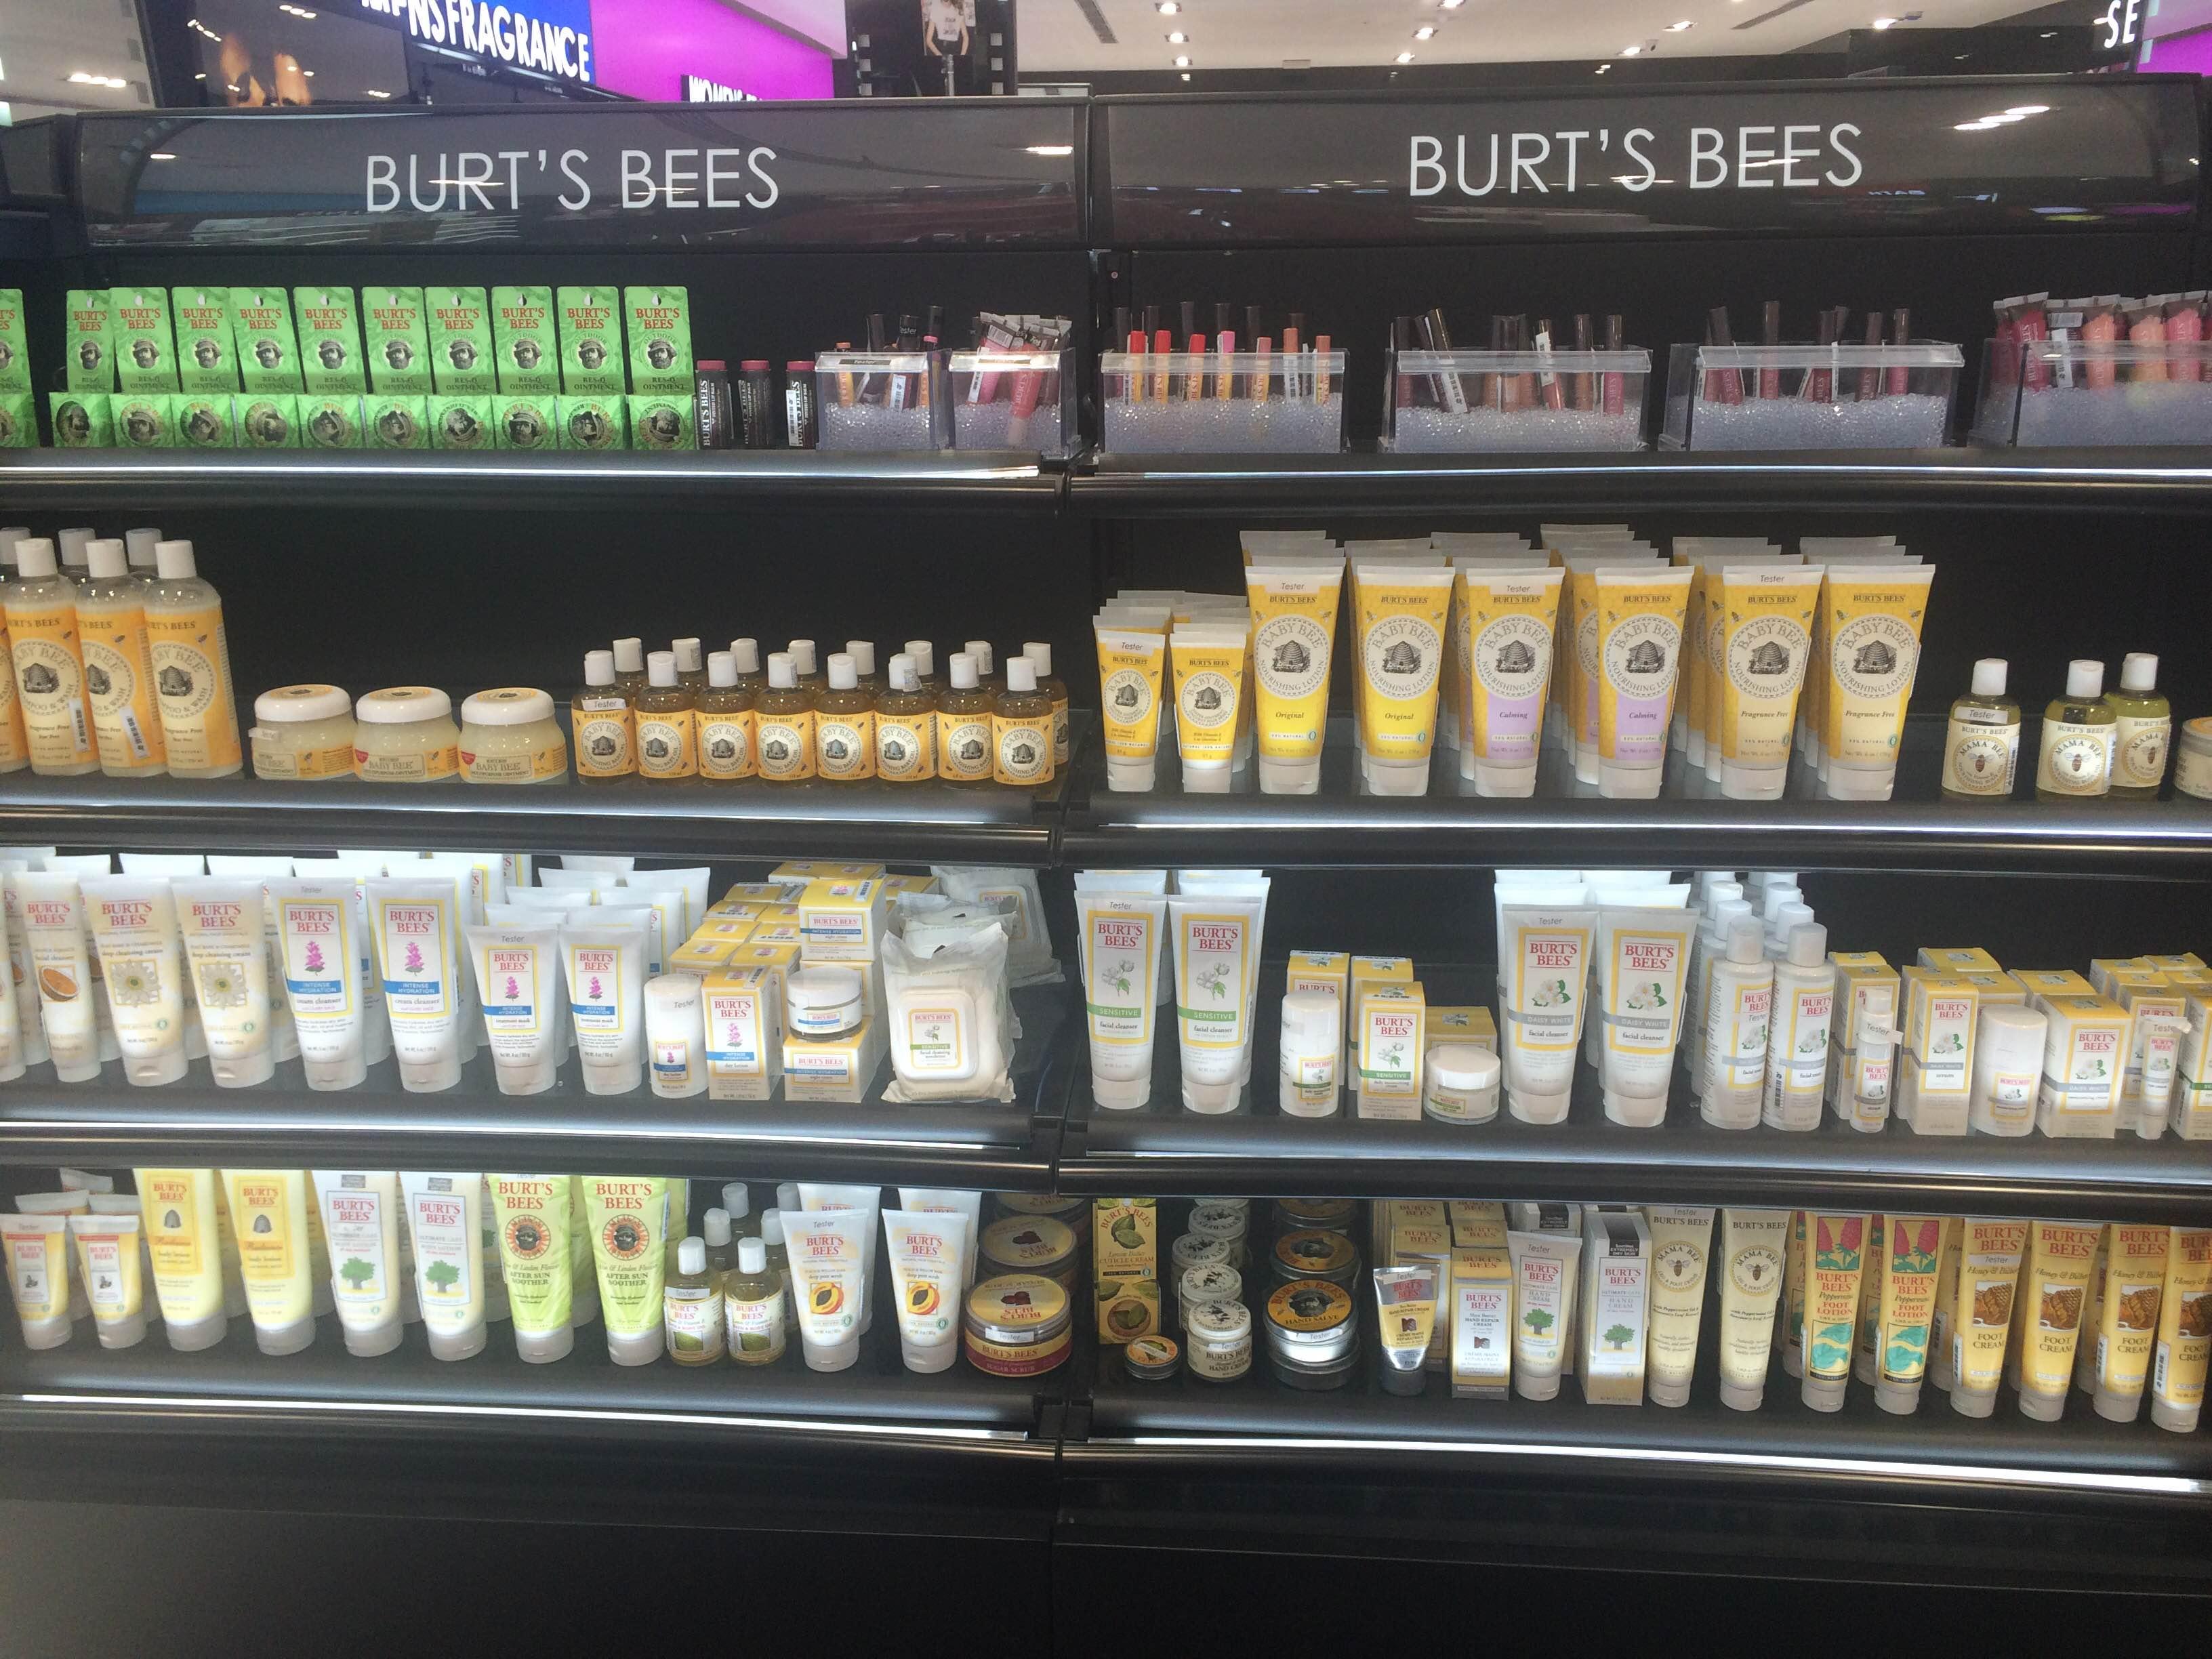 Bangalore Sephora pictures Burt's bees